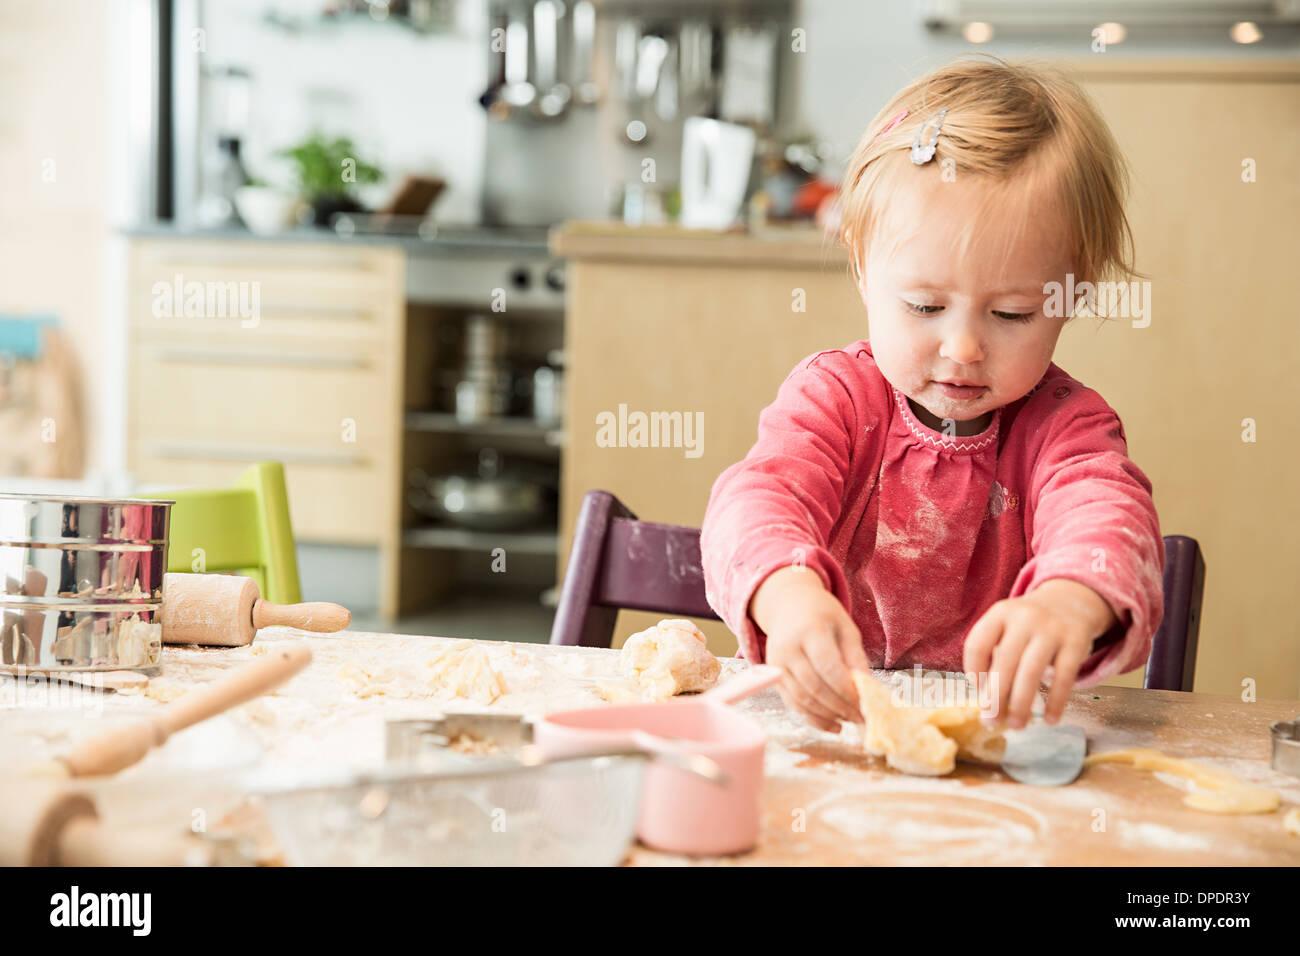 Baby Girl baking in kitchen Photo Stock